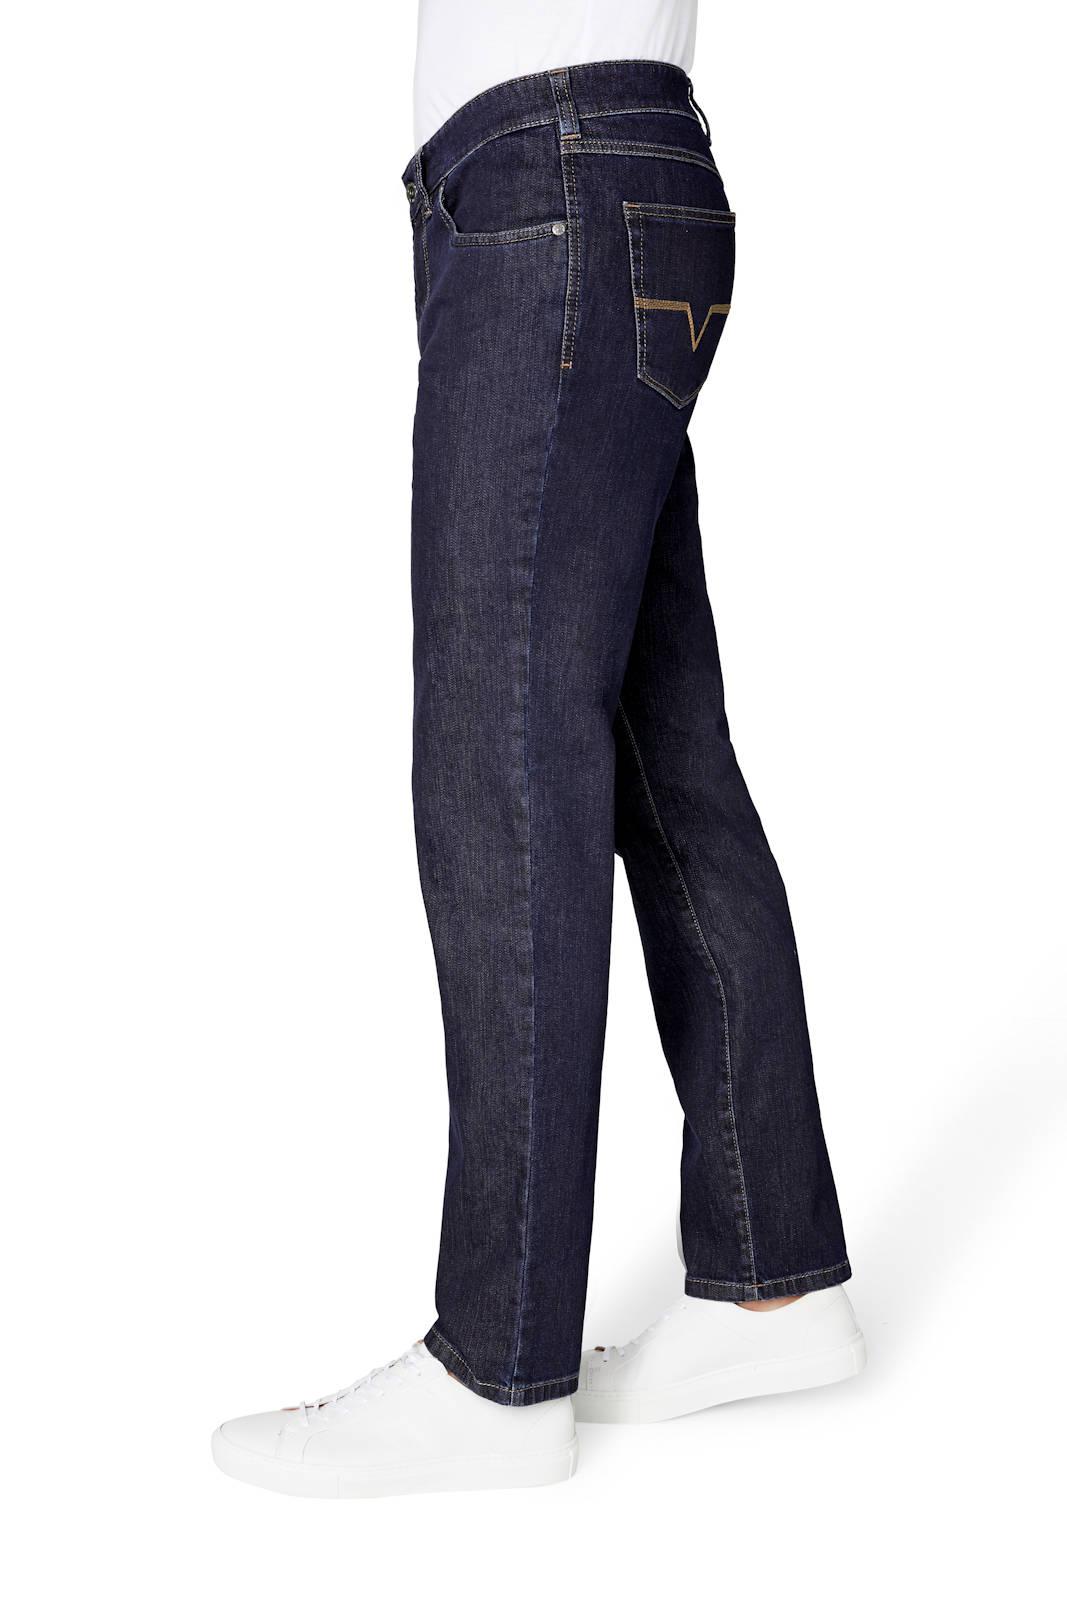 Atelier-GARDEUR-Jeans-NEVIO-11-Regular-Fit-Herren-Hose-Straight-Leg-Denim-NEU Indexbild 3